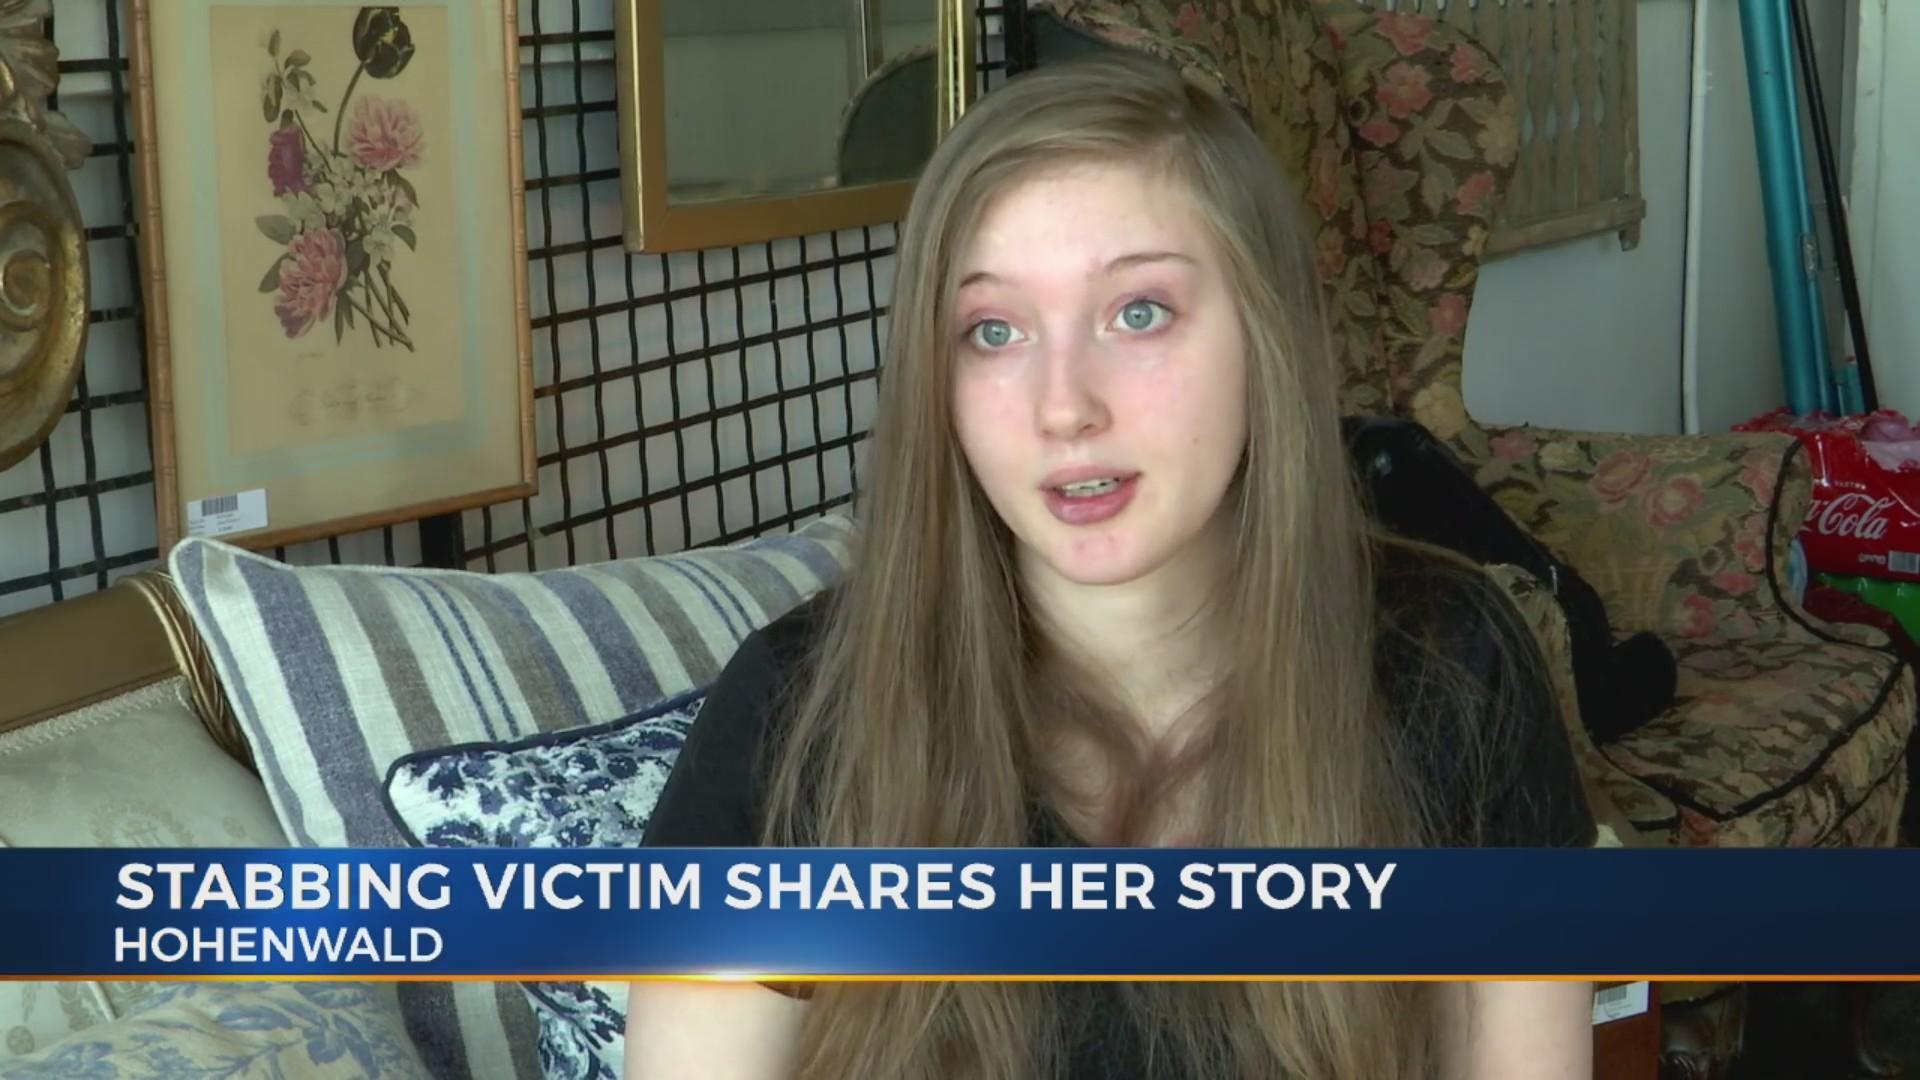 Survivor shares disappointment after ex-husband receives light sentence in brutal stabbing